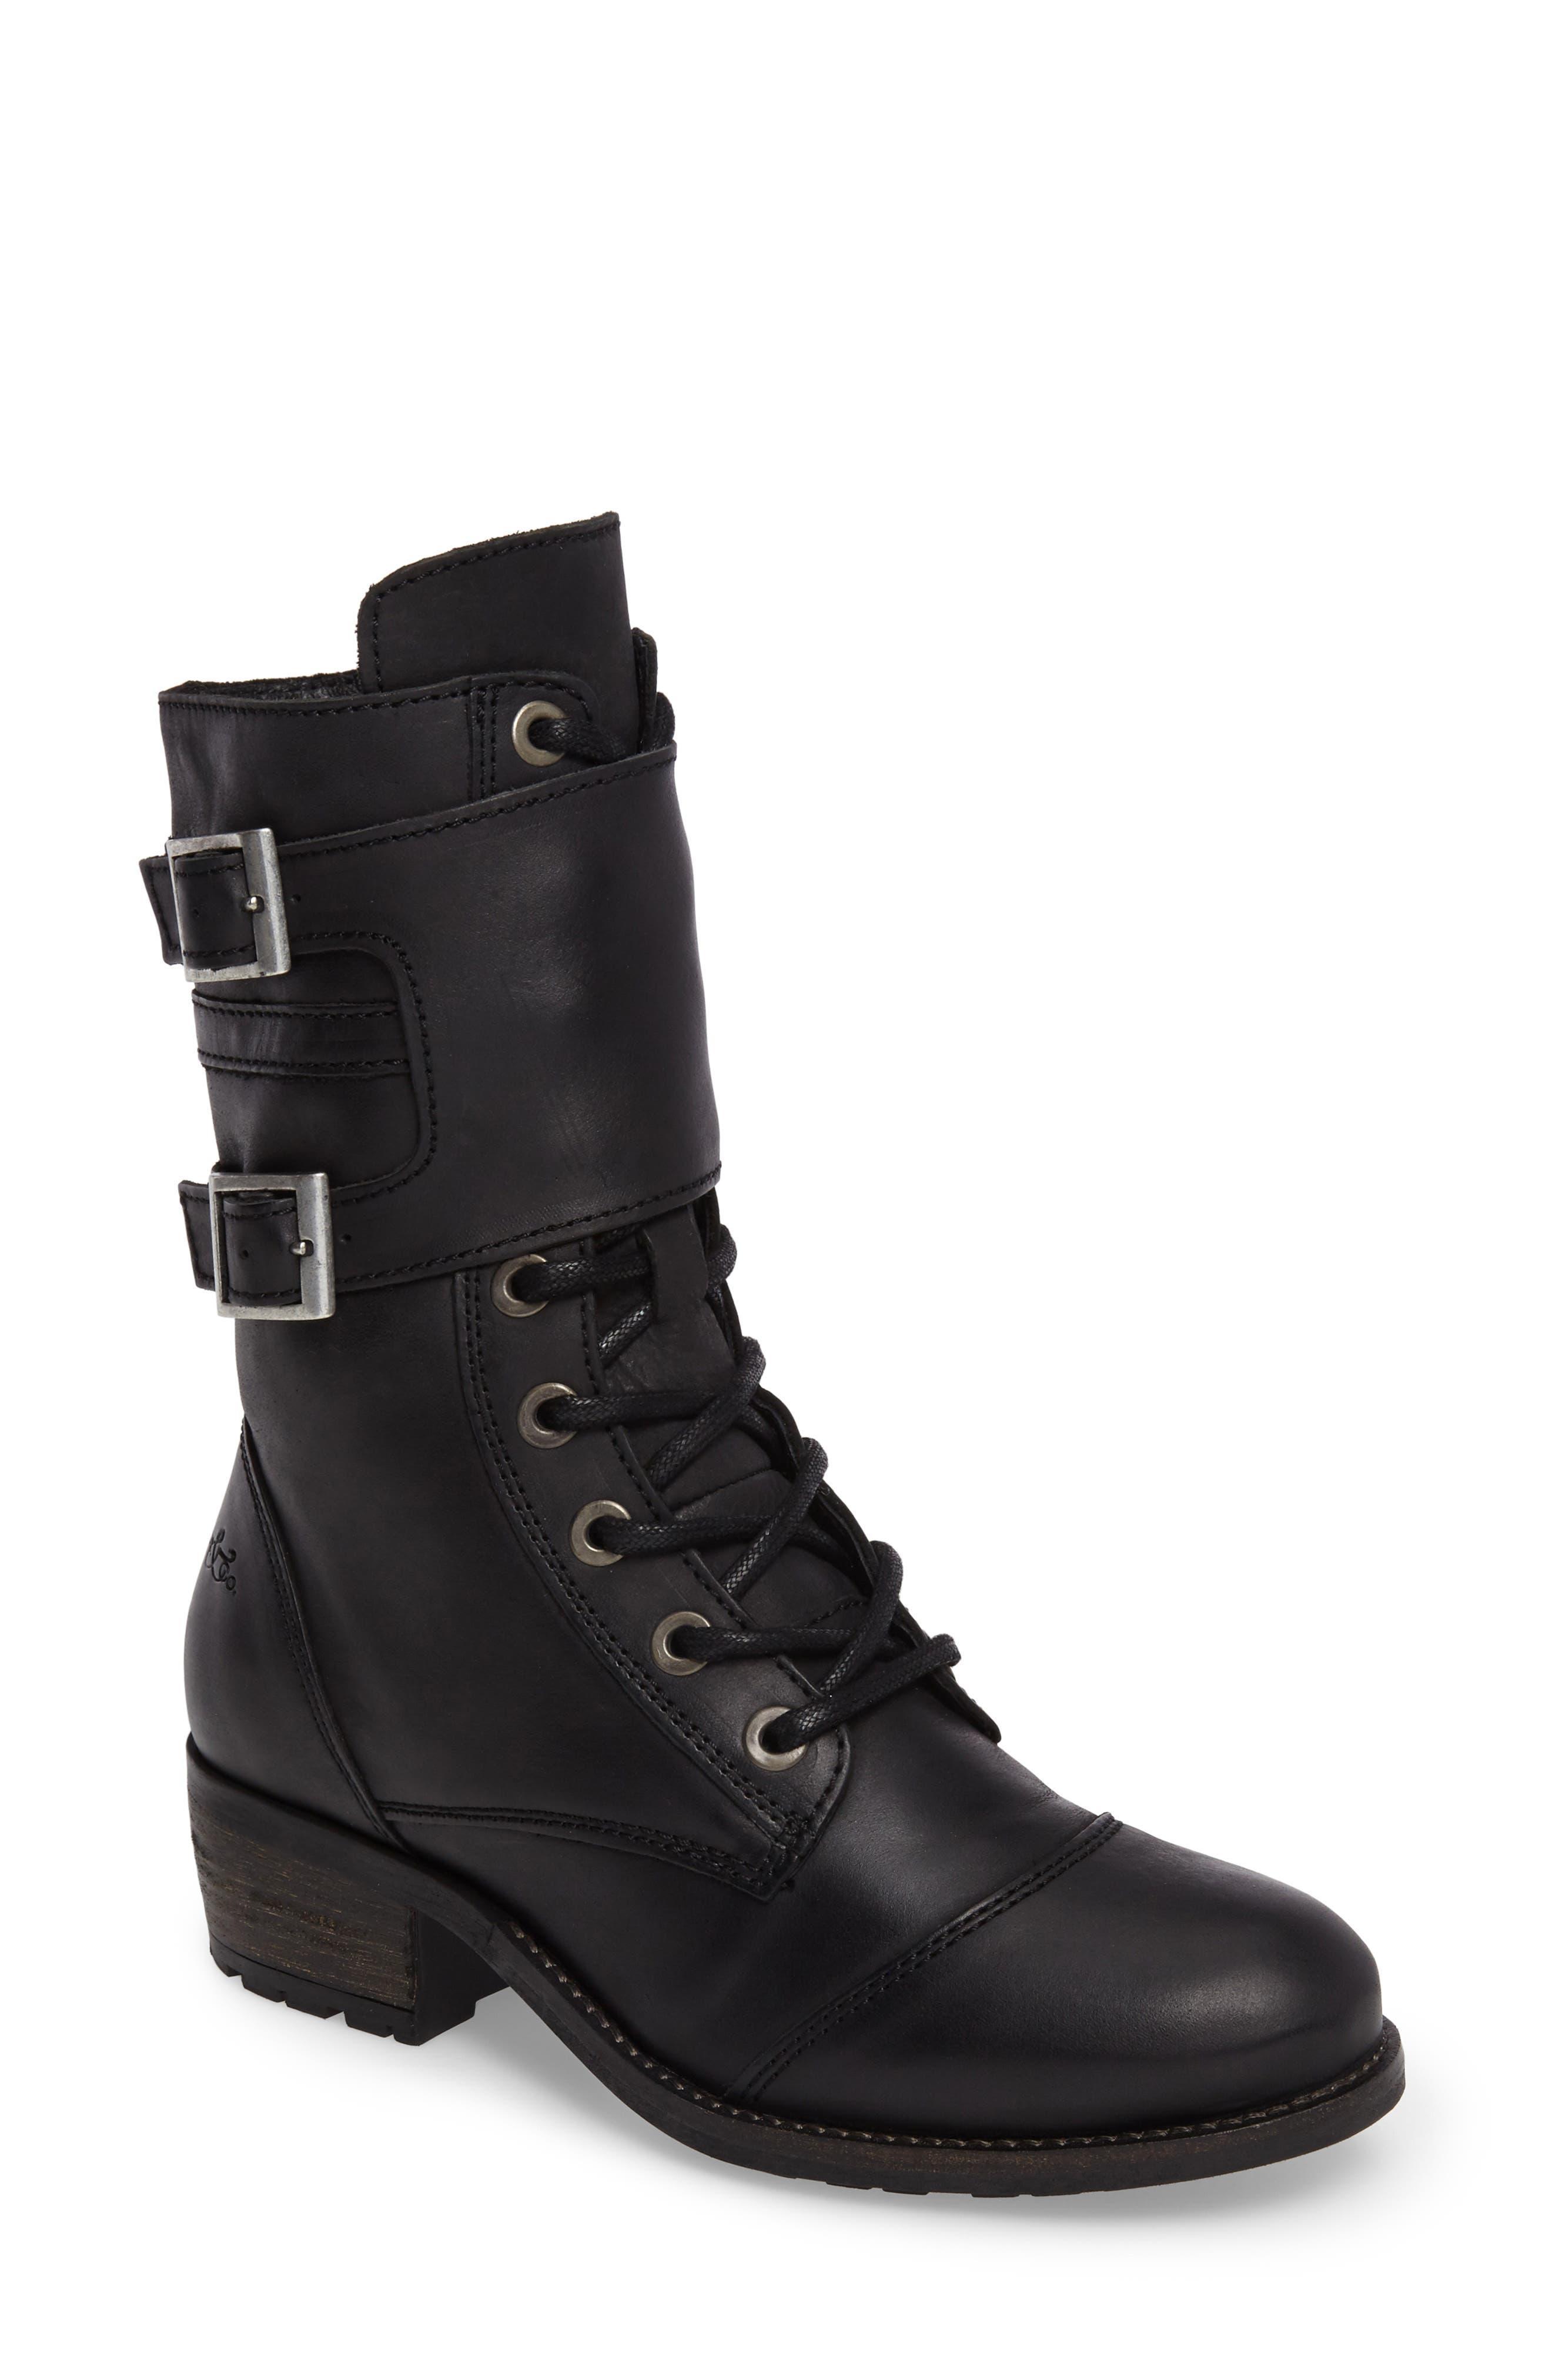 Lune Waterproof Moto Boot,                         Main,                         color, Black Varese Leather